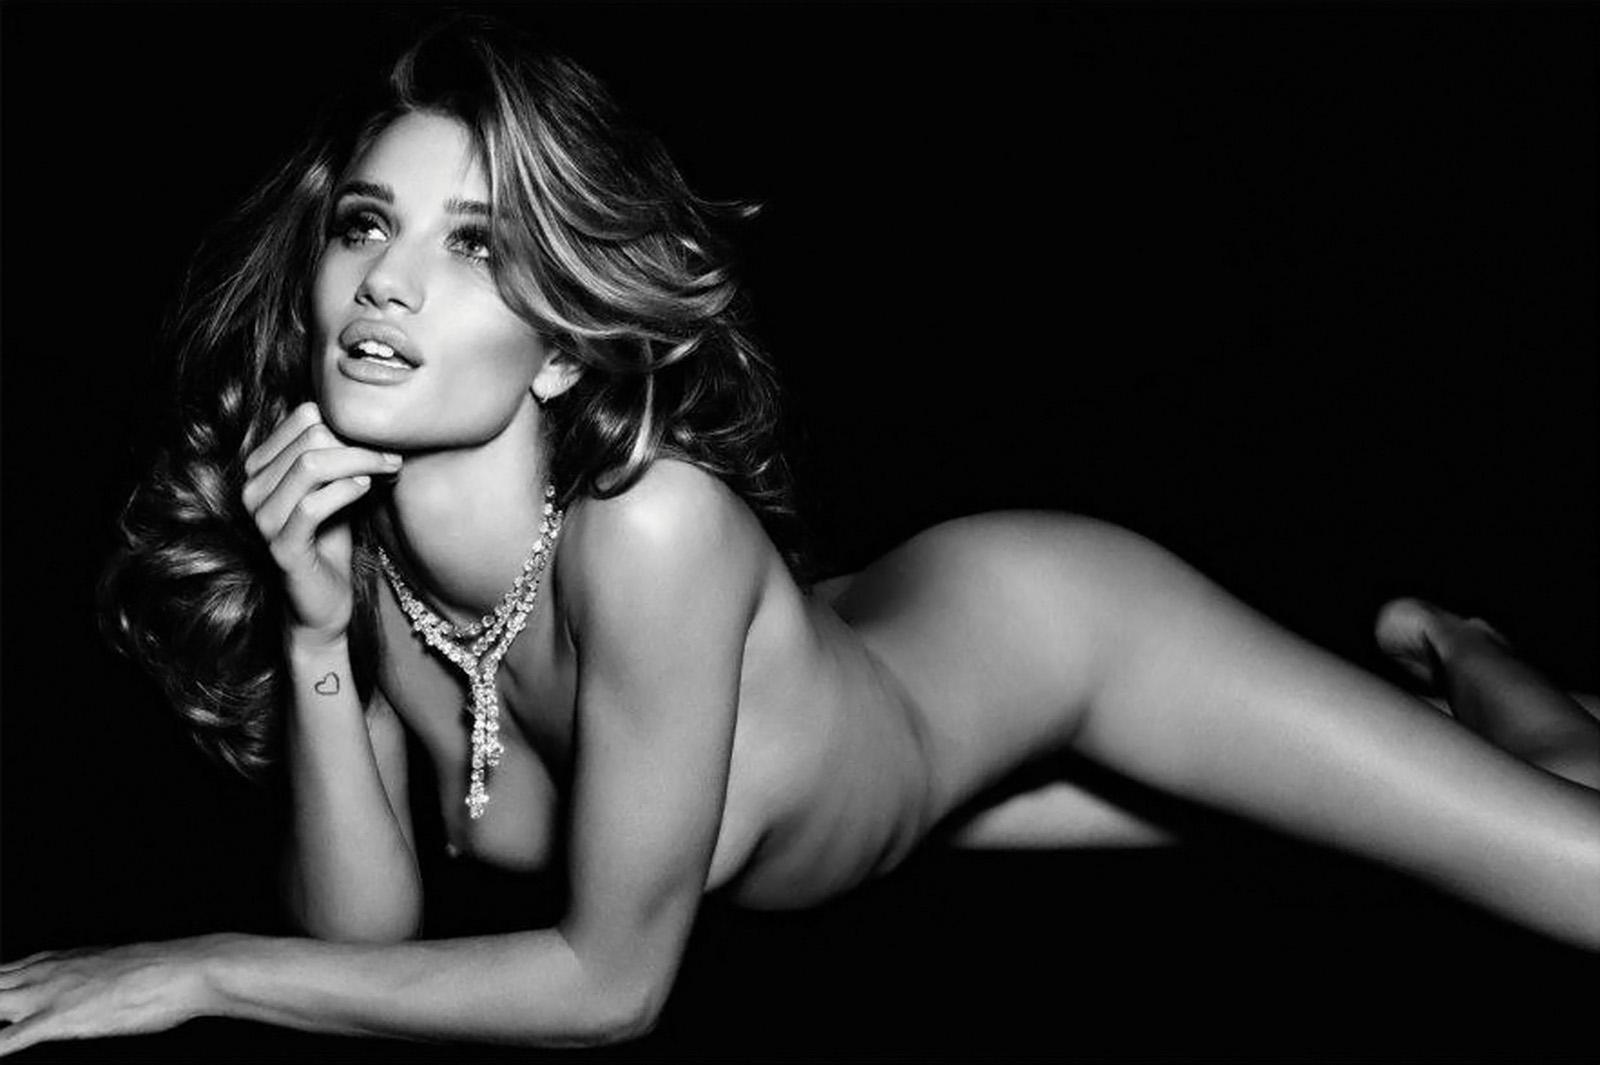 http://3.bp.blogspot.com/-5CFZYKeQiqY/TqOoMh5v7dI/AAAAAAAACbs/3YxNn0BiGkM/s1600/Rosie+Huntington-Whiteley+Nude+in+Vogue+magazine+1.jpg